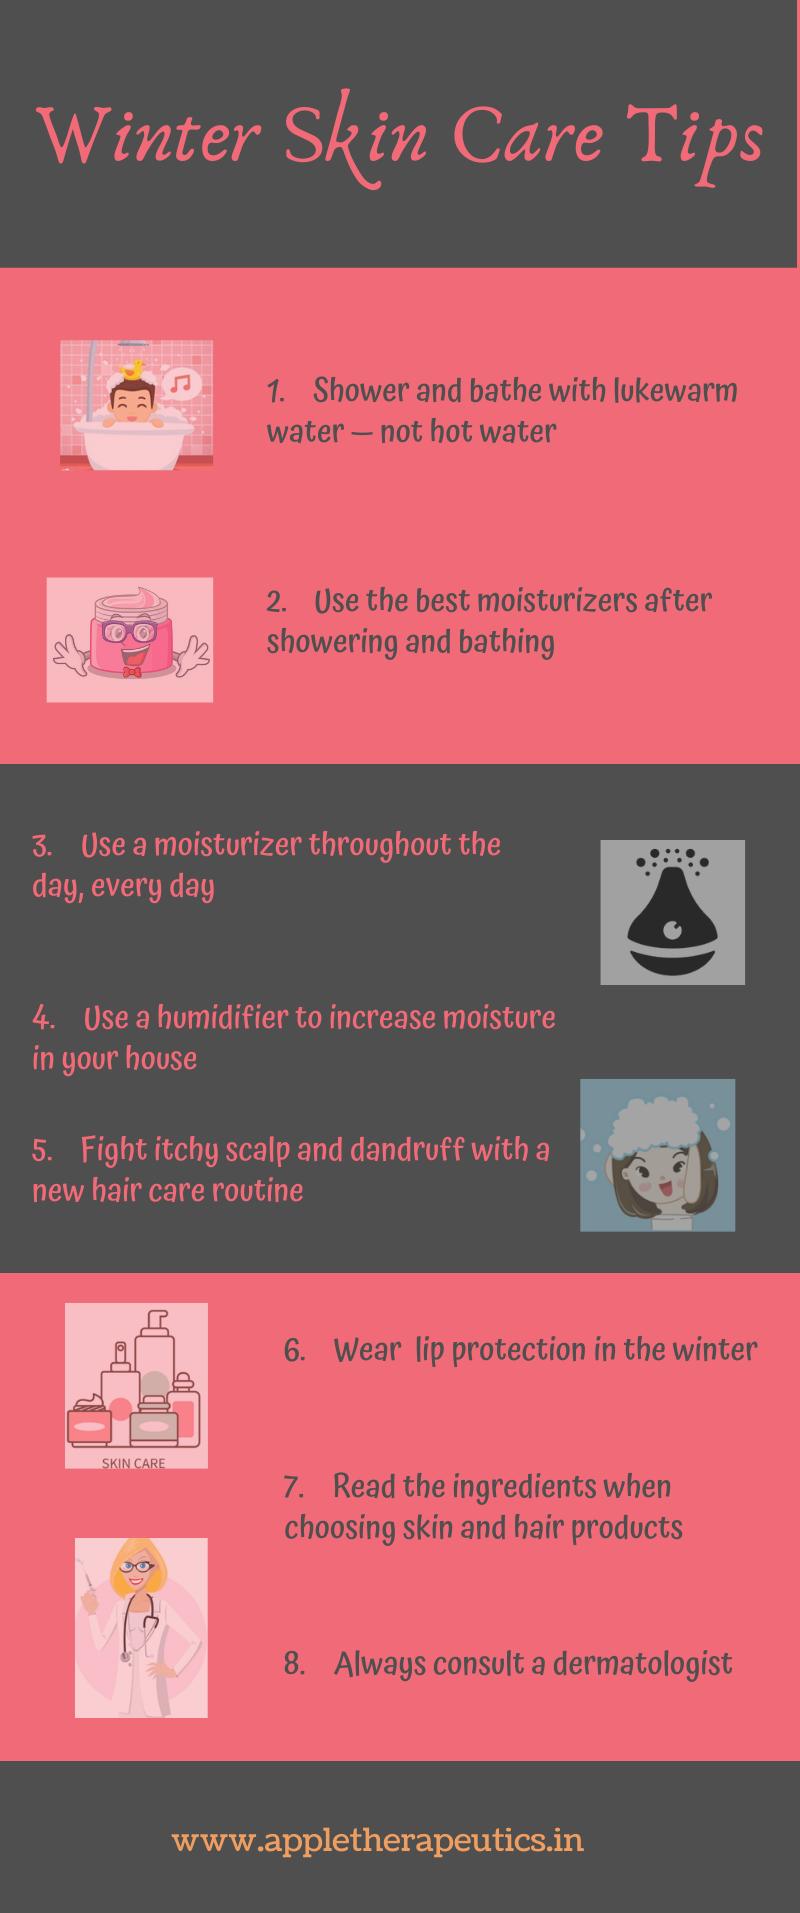 How To Take Care Of Skin In Winters In 2020 Winter Skin Care Dry Sensitive Skin Acne Prone